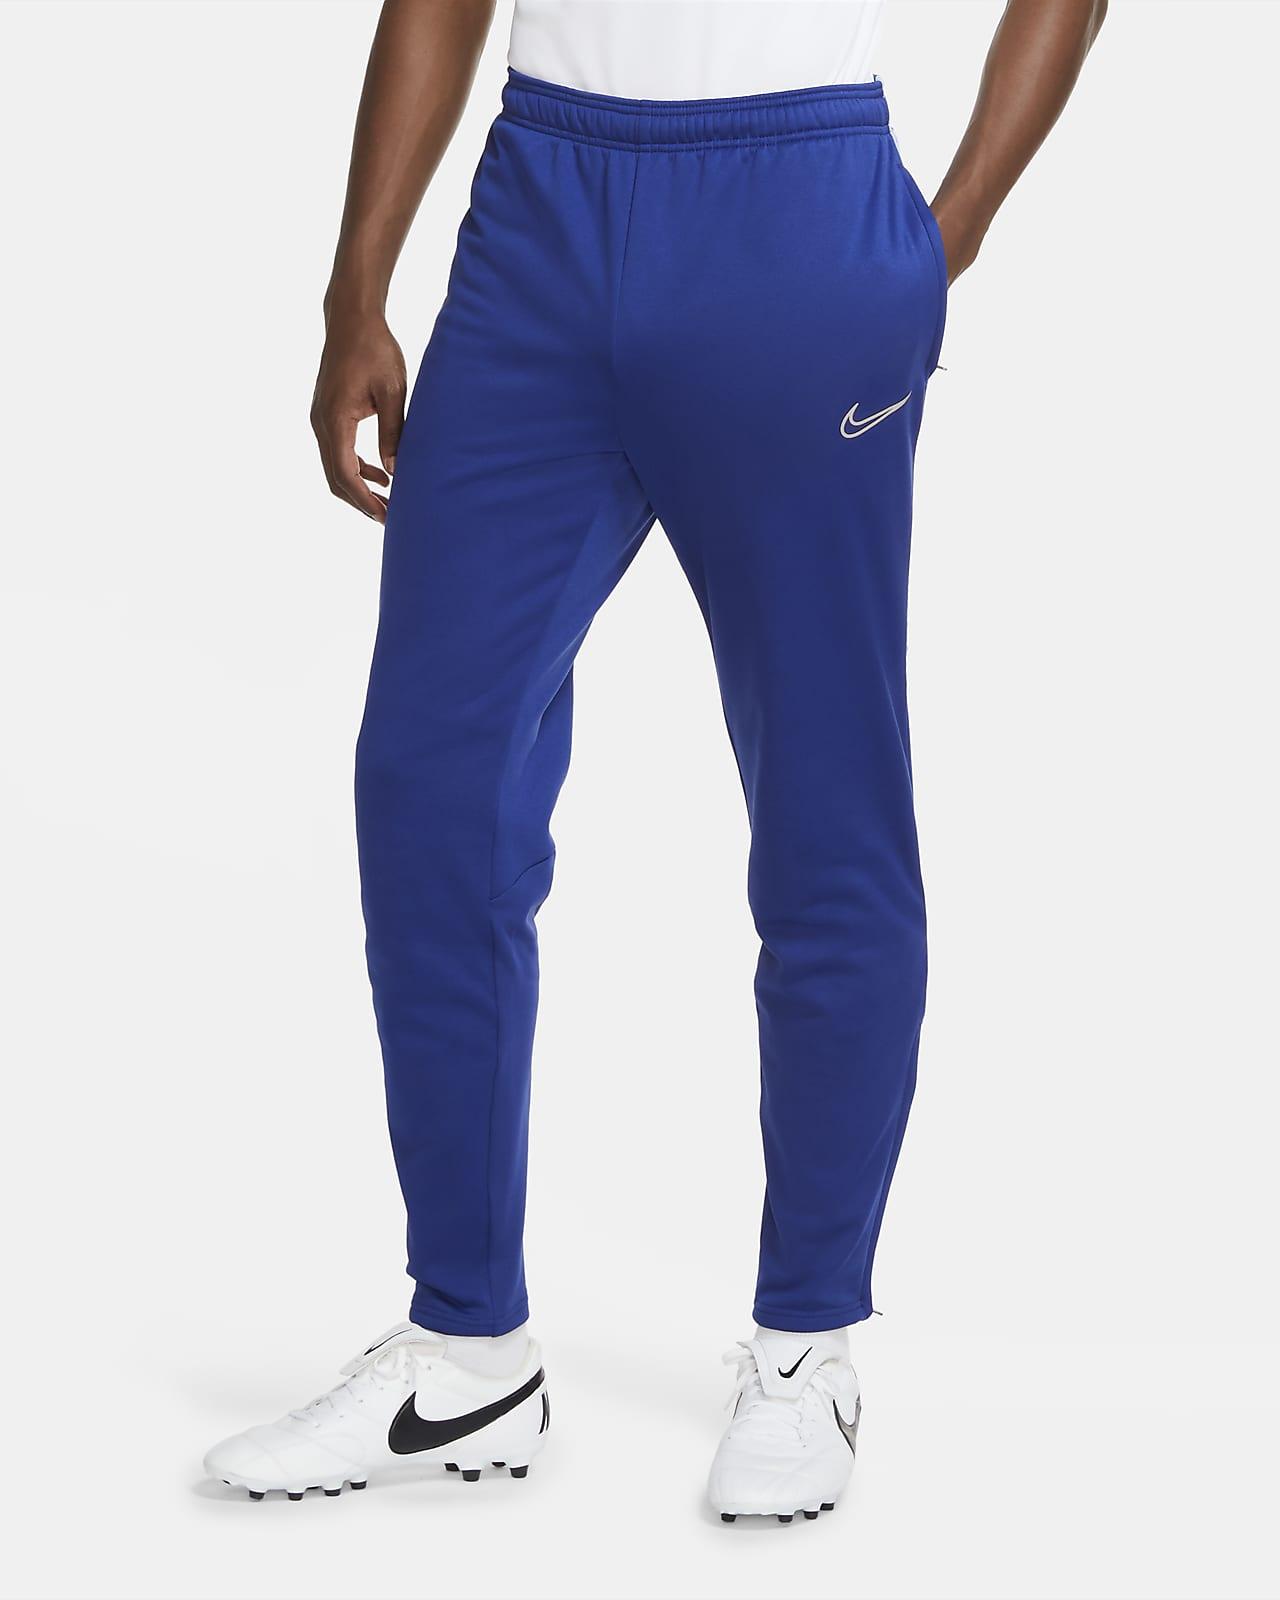 Pánské fotbalové kalhoty Nike Therma Academy Winter Warrior